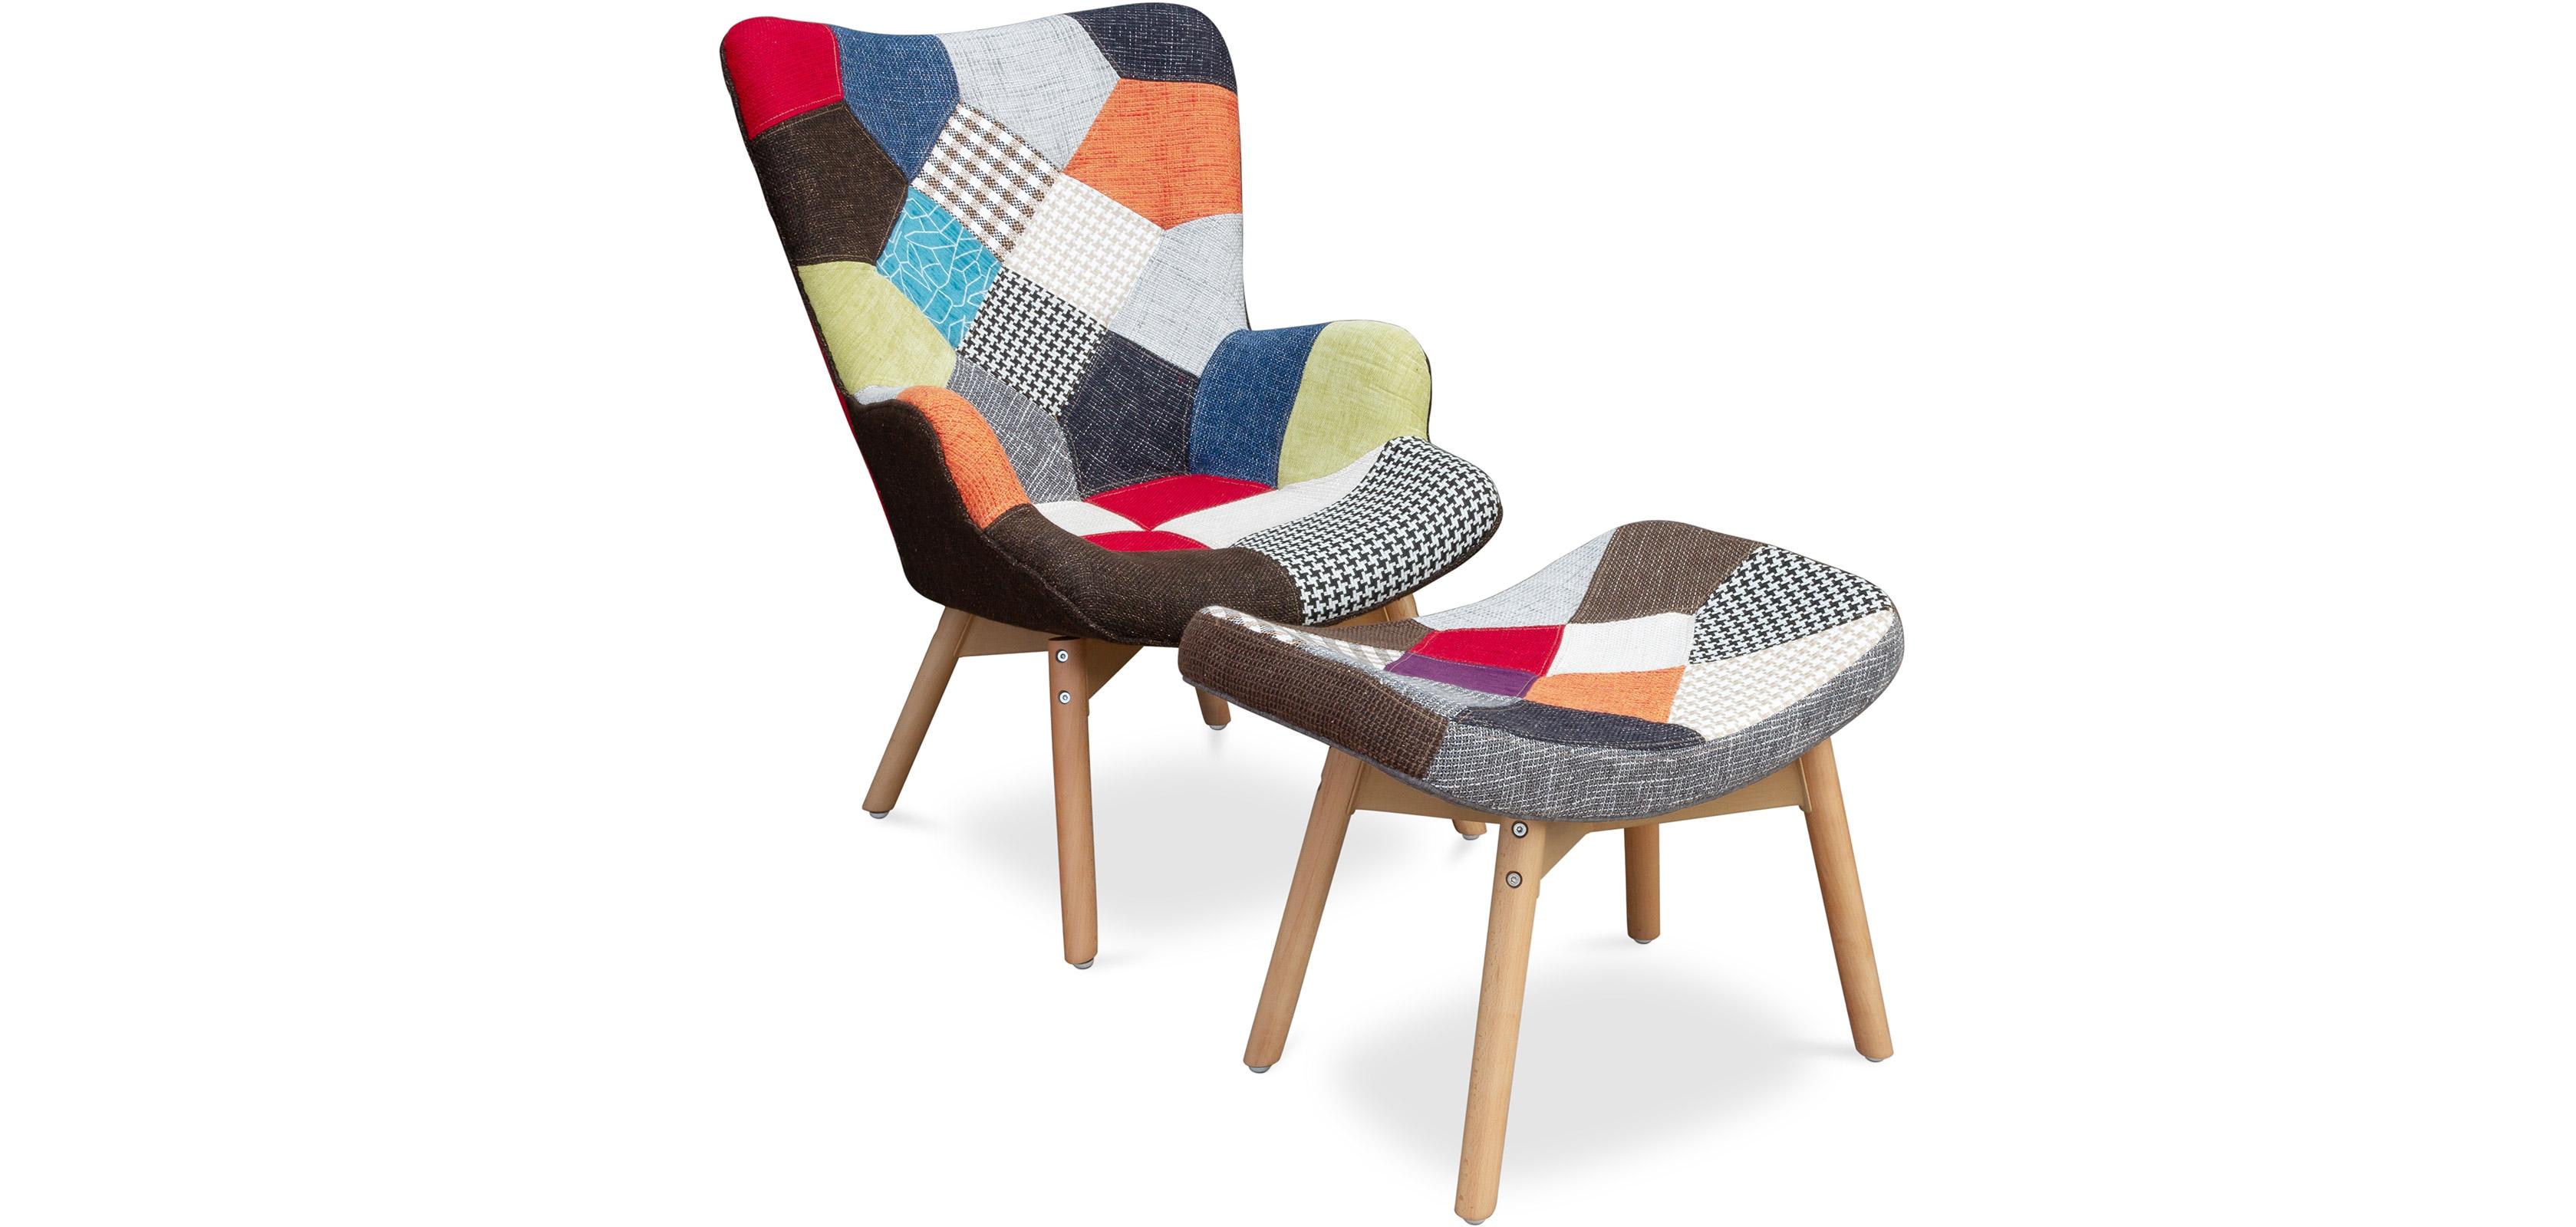 Buy Contor Armchair and Footstool Patchwork Lar  - Scandinavian design  Multicolour 59248 - in the UK